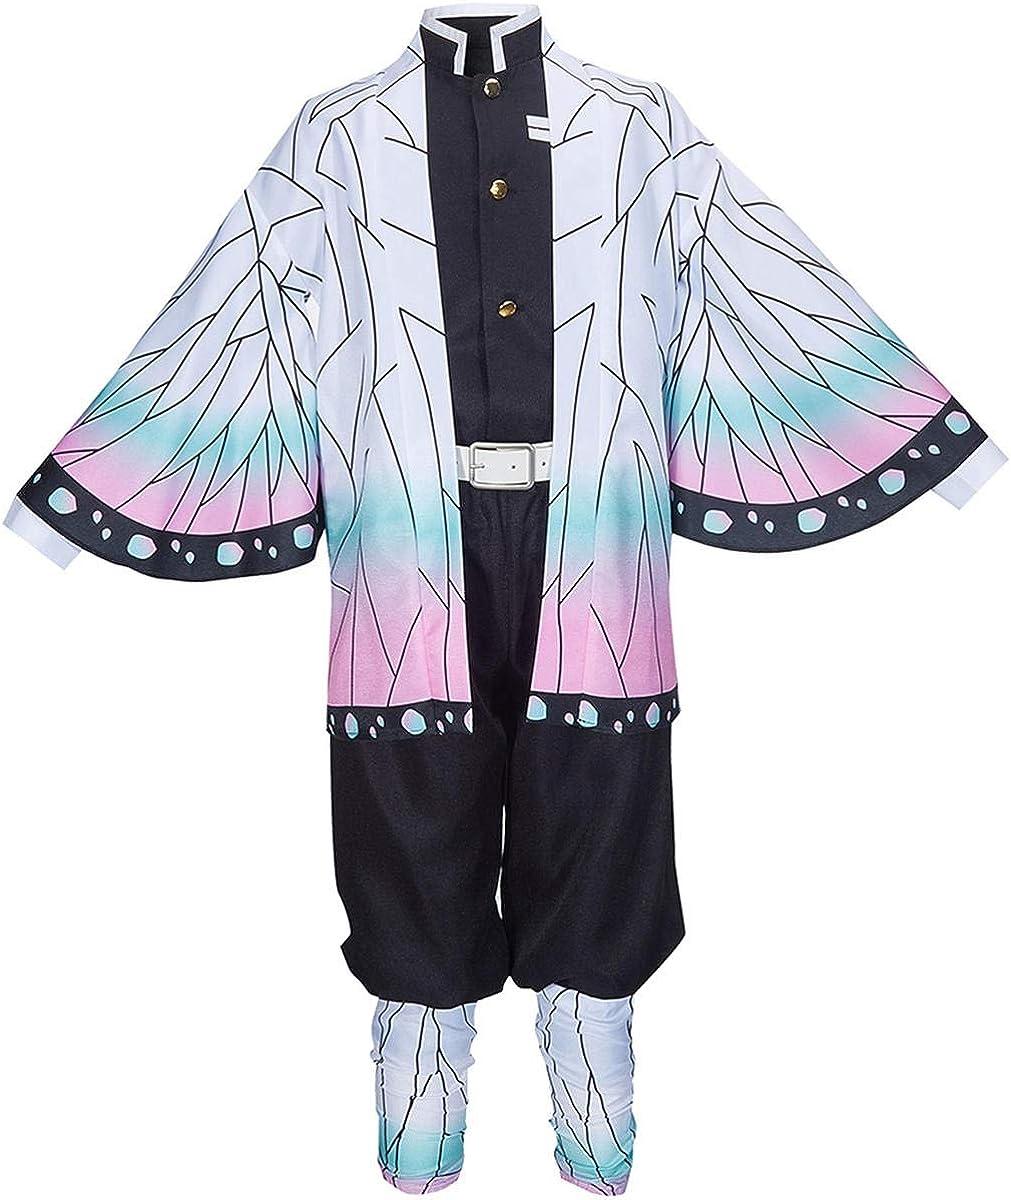 MIAOCOS Demon Slayer Kochou Shinobu Uniform List price Charlotte Mall C Father Boy Cosplay